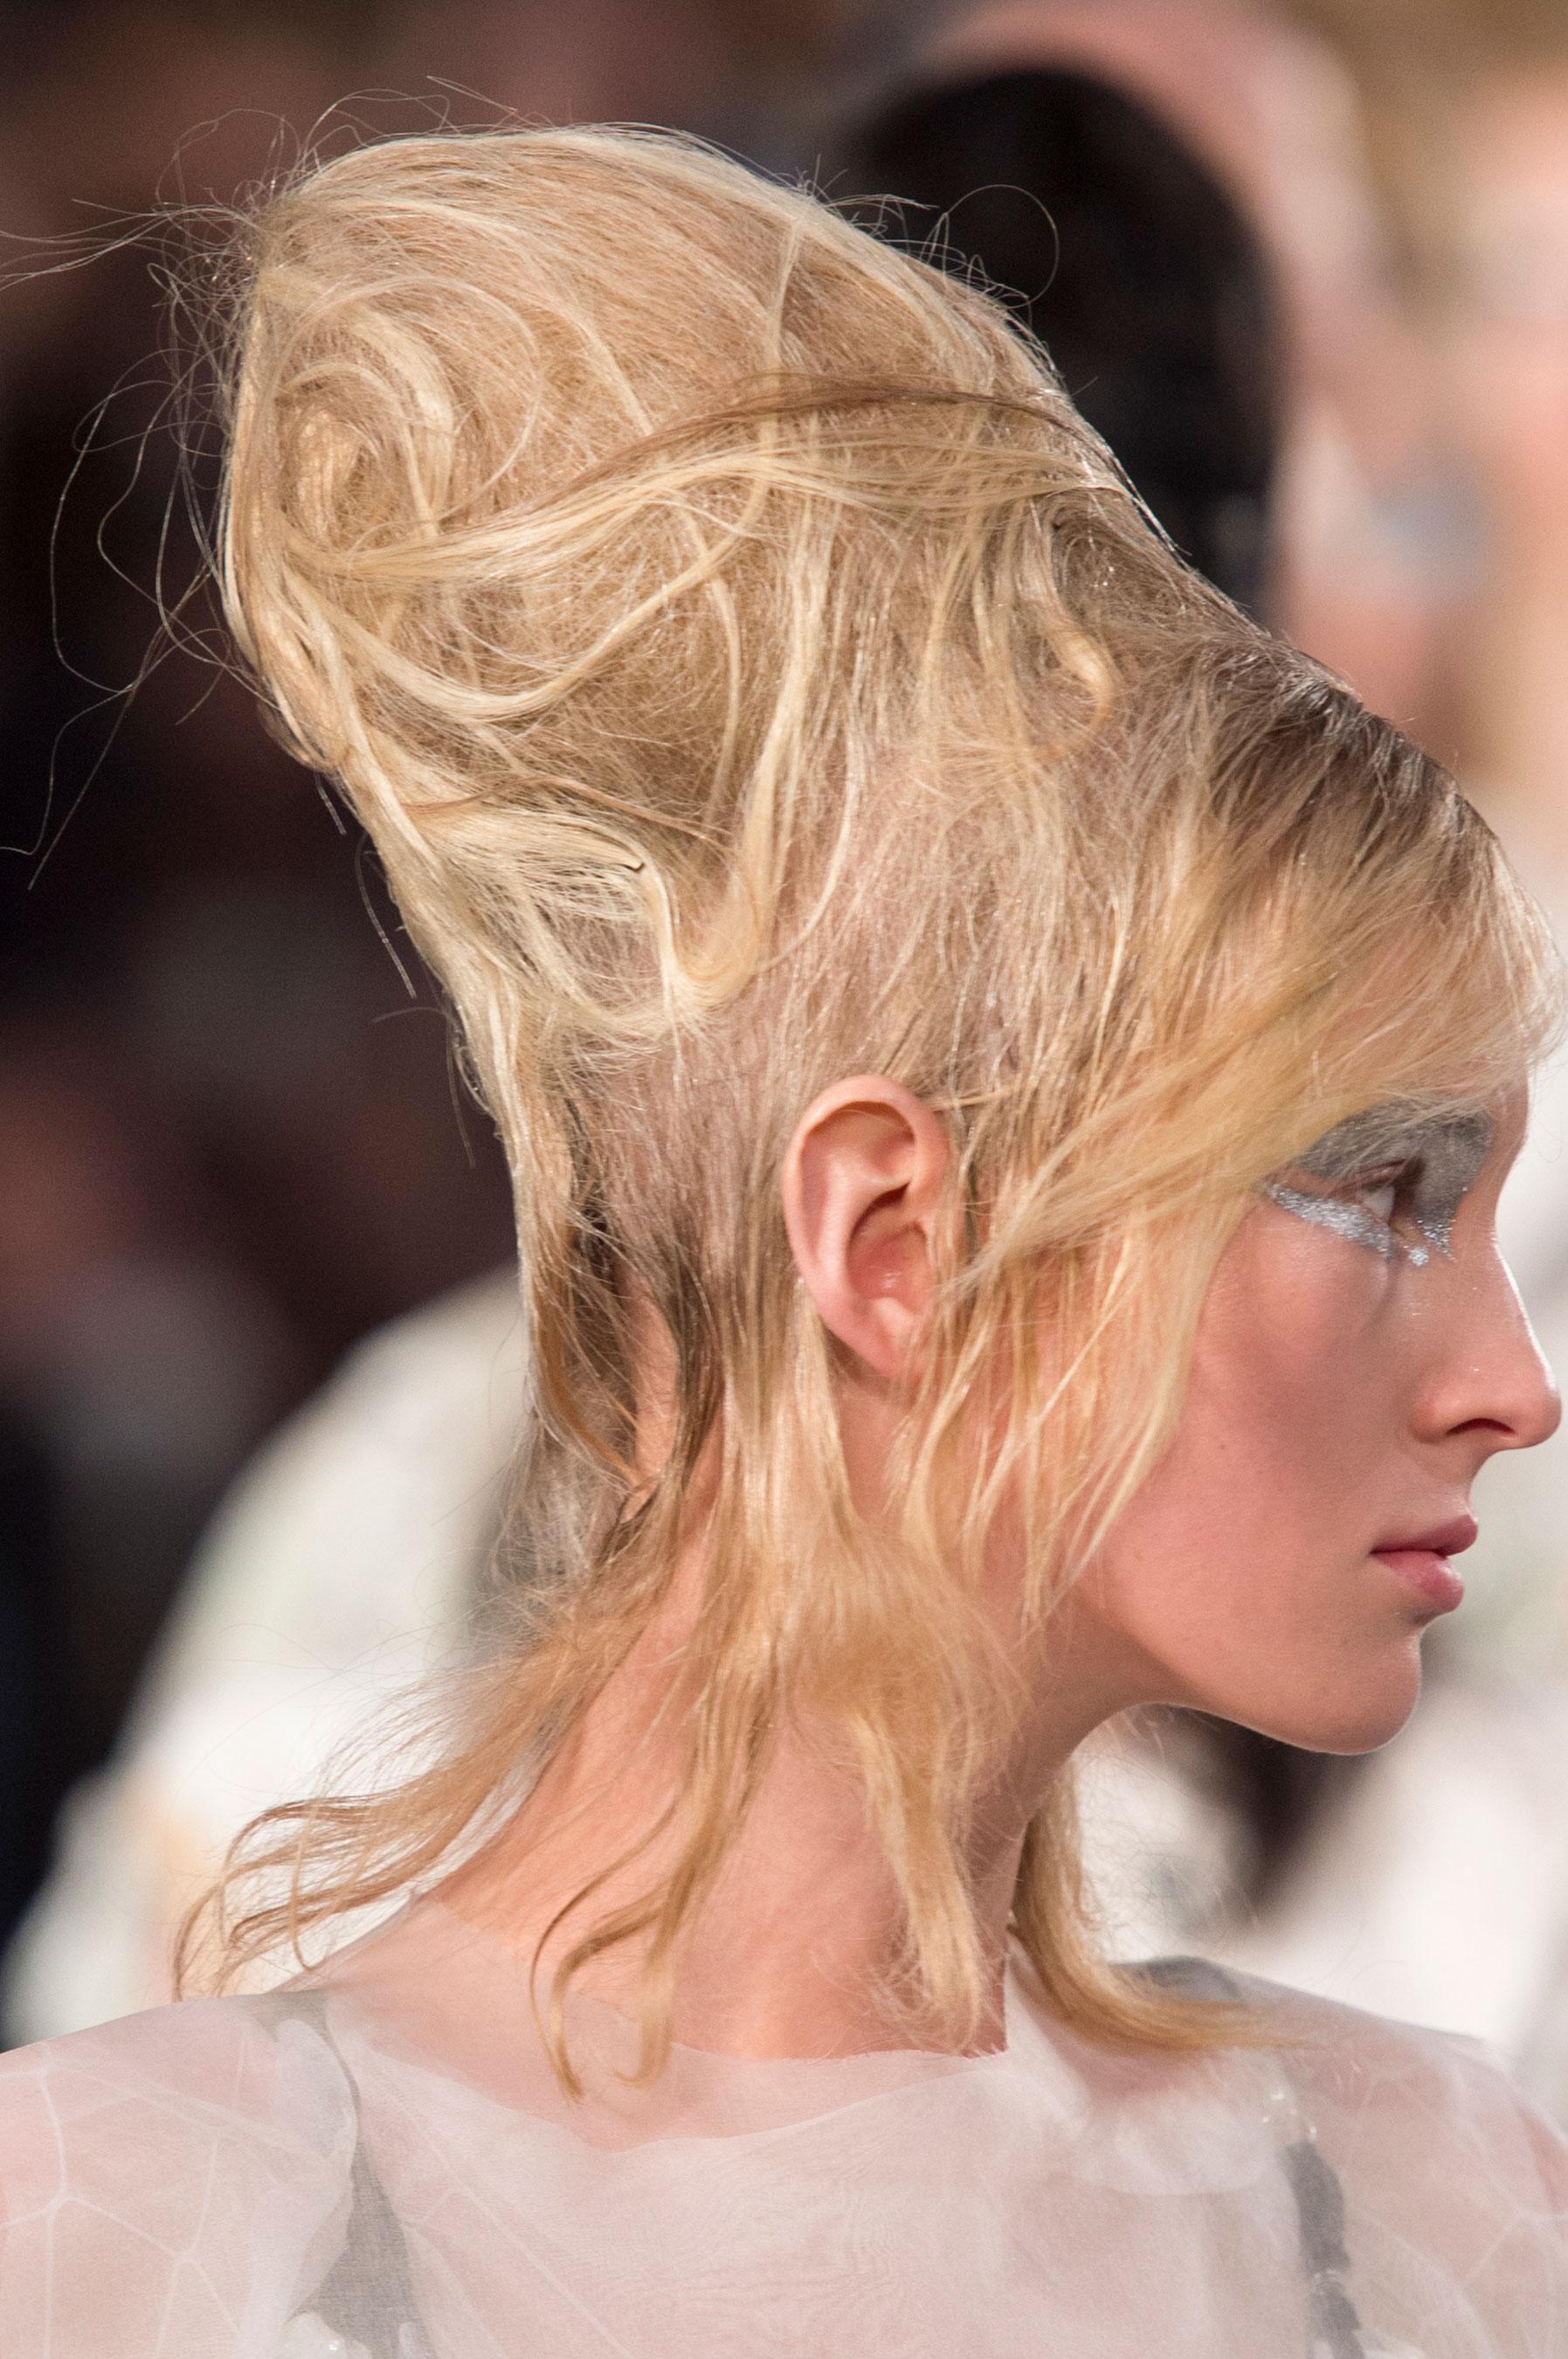 Maison-Margiela-spring-2016-runway-beauty-fashion-show-the-impression-059